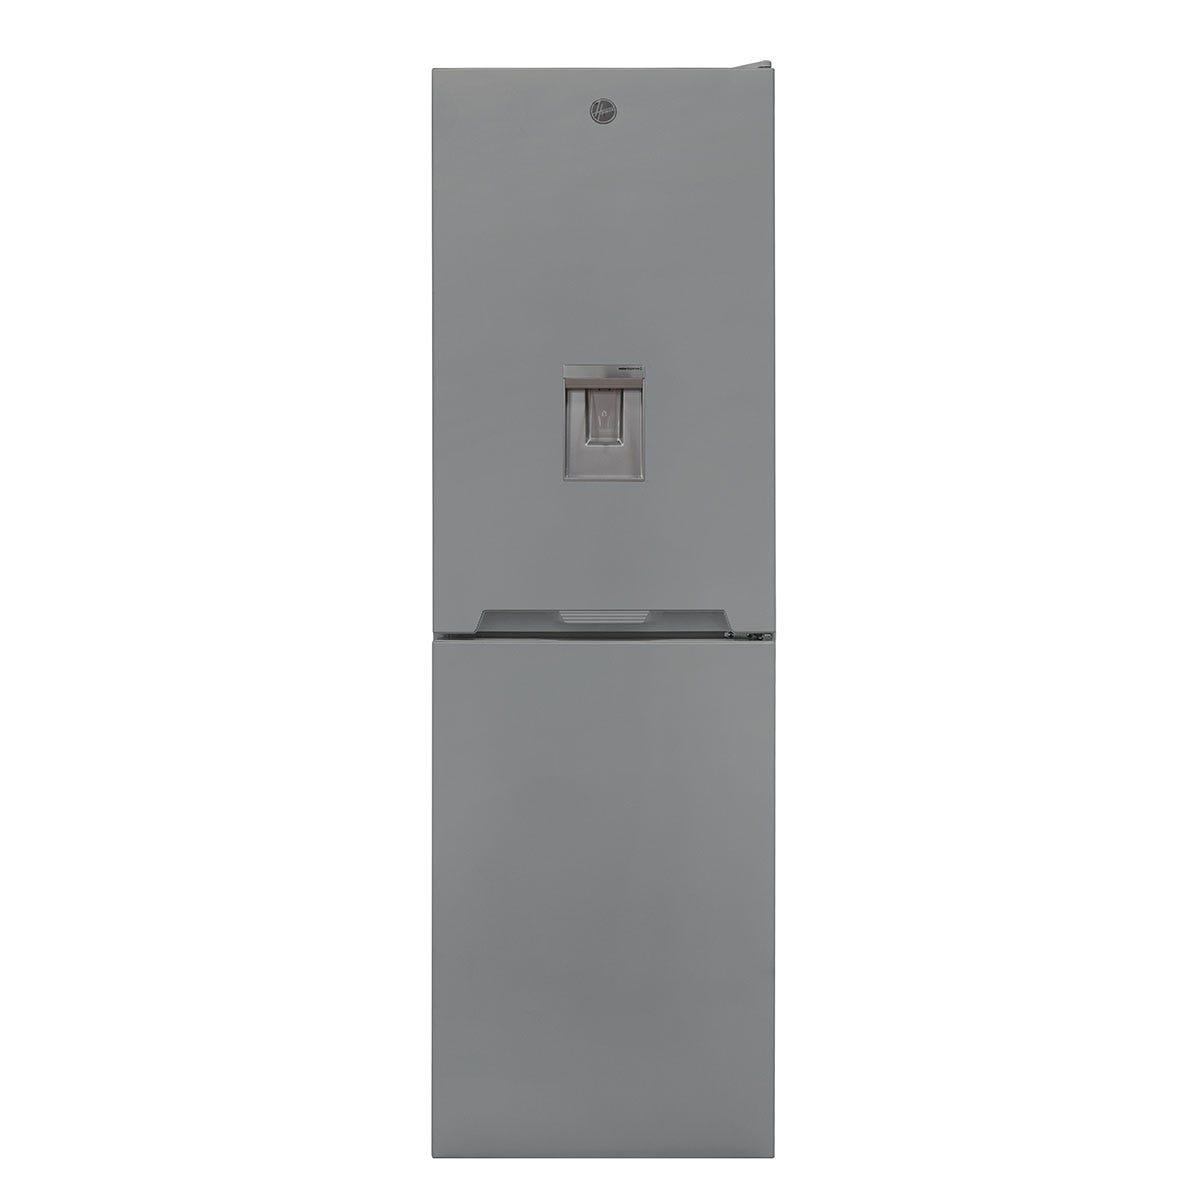 Hoover HOCV1S517FWXK 163L/114L Freestanding Static Fridge Freezer with Water Through The Door - Grey